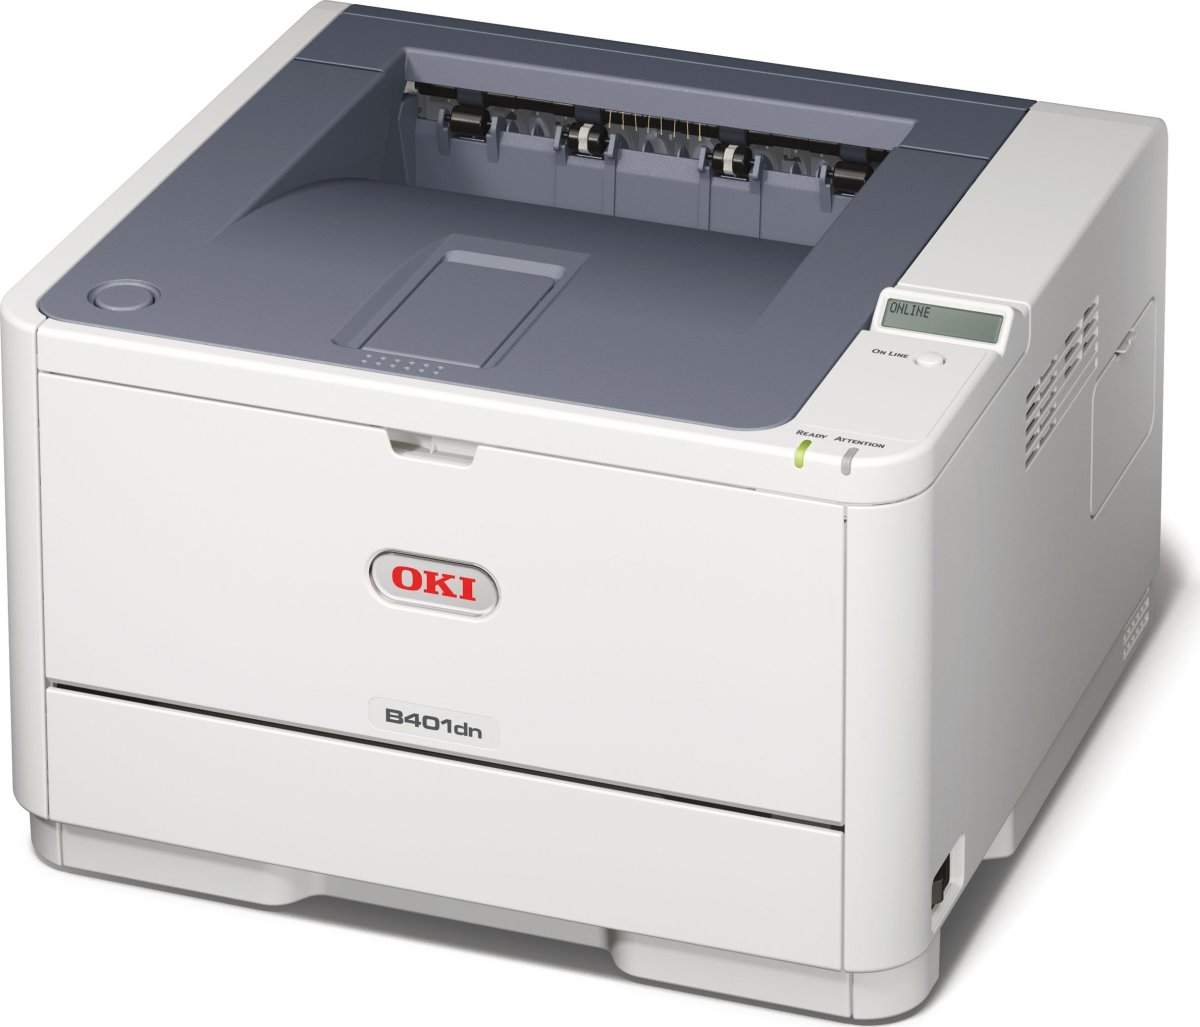 OKI B432dn sort/hvid laserprinter